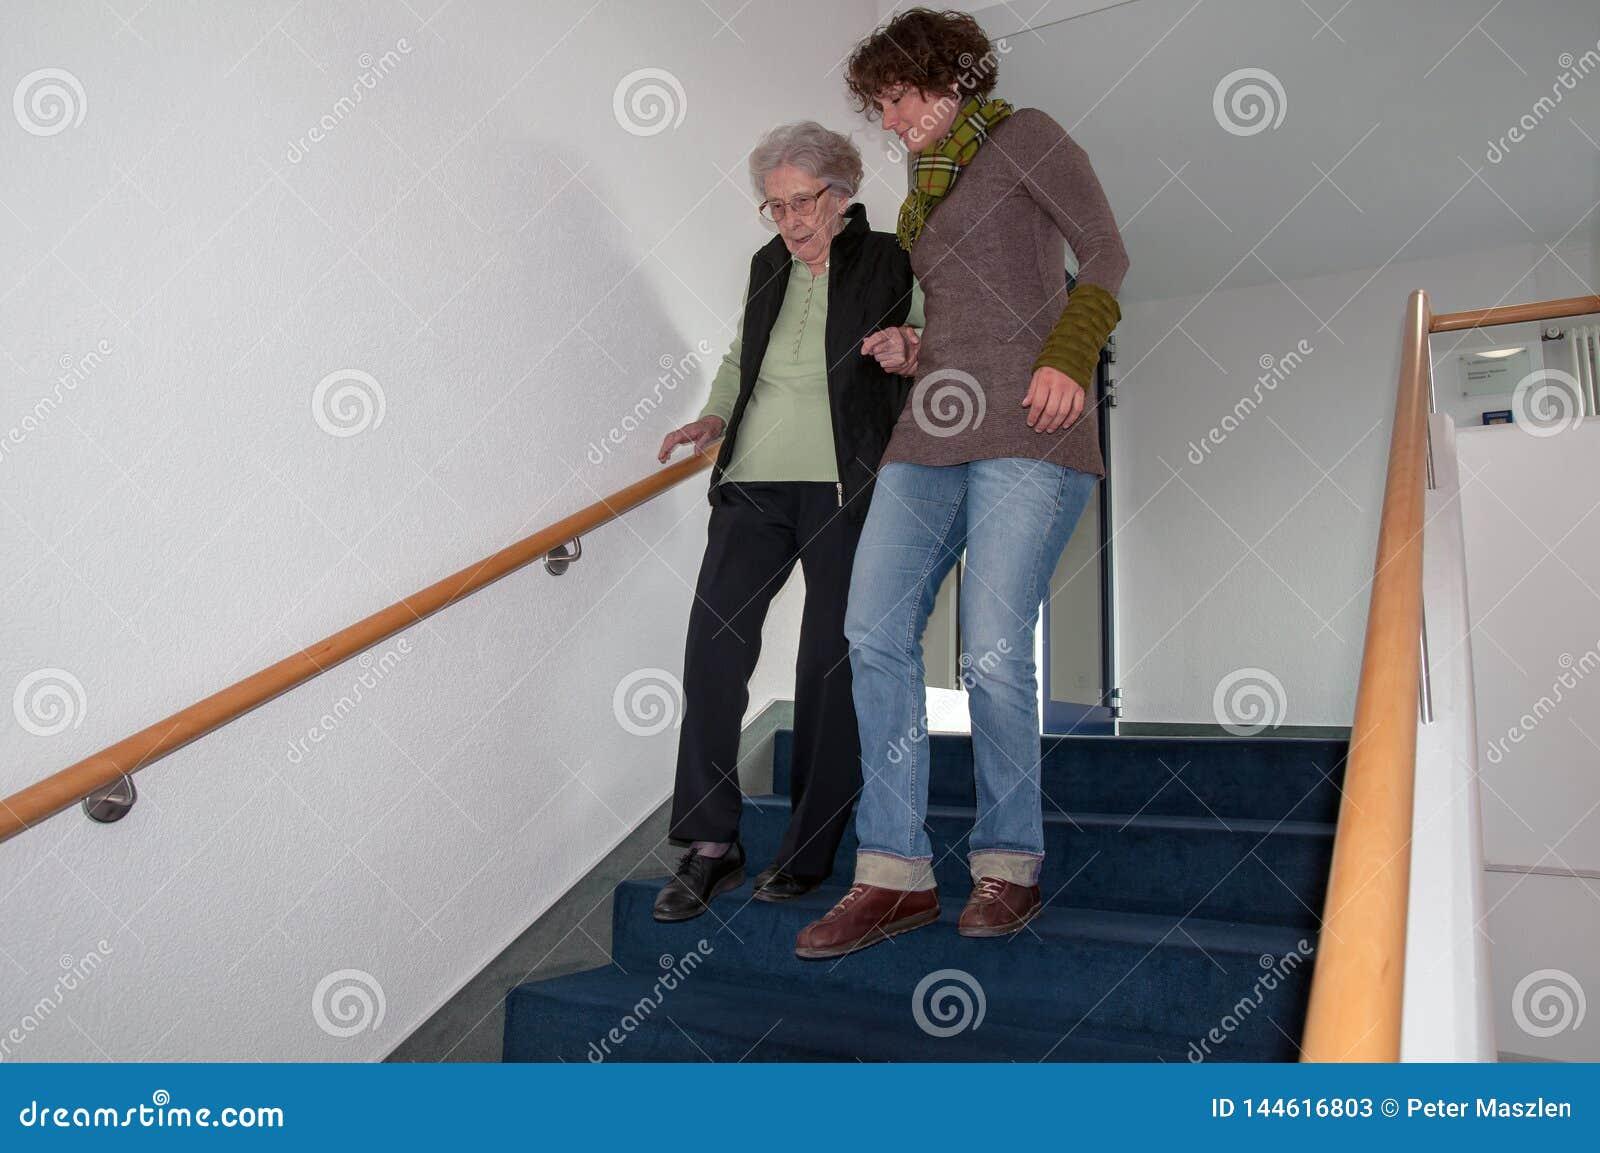 Caregiver helping senior woman walking down the stairs